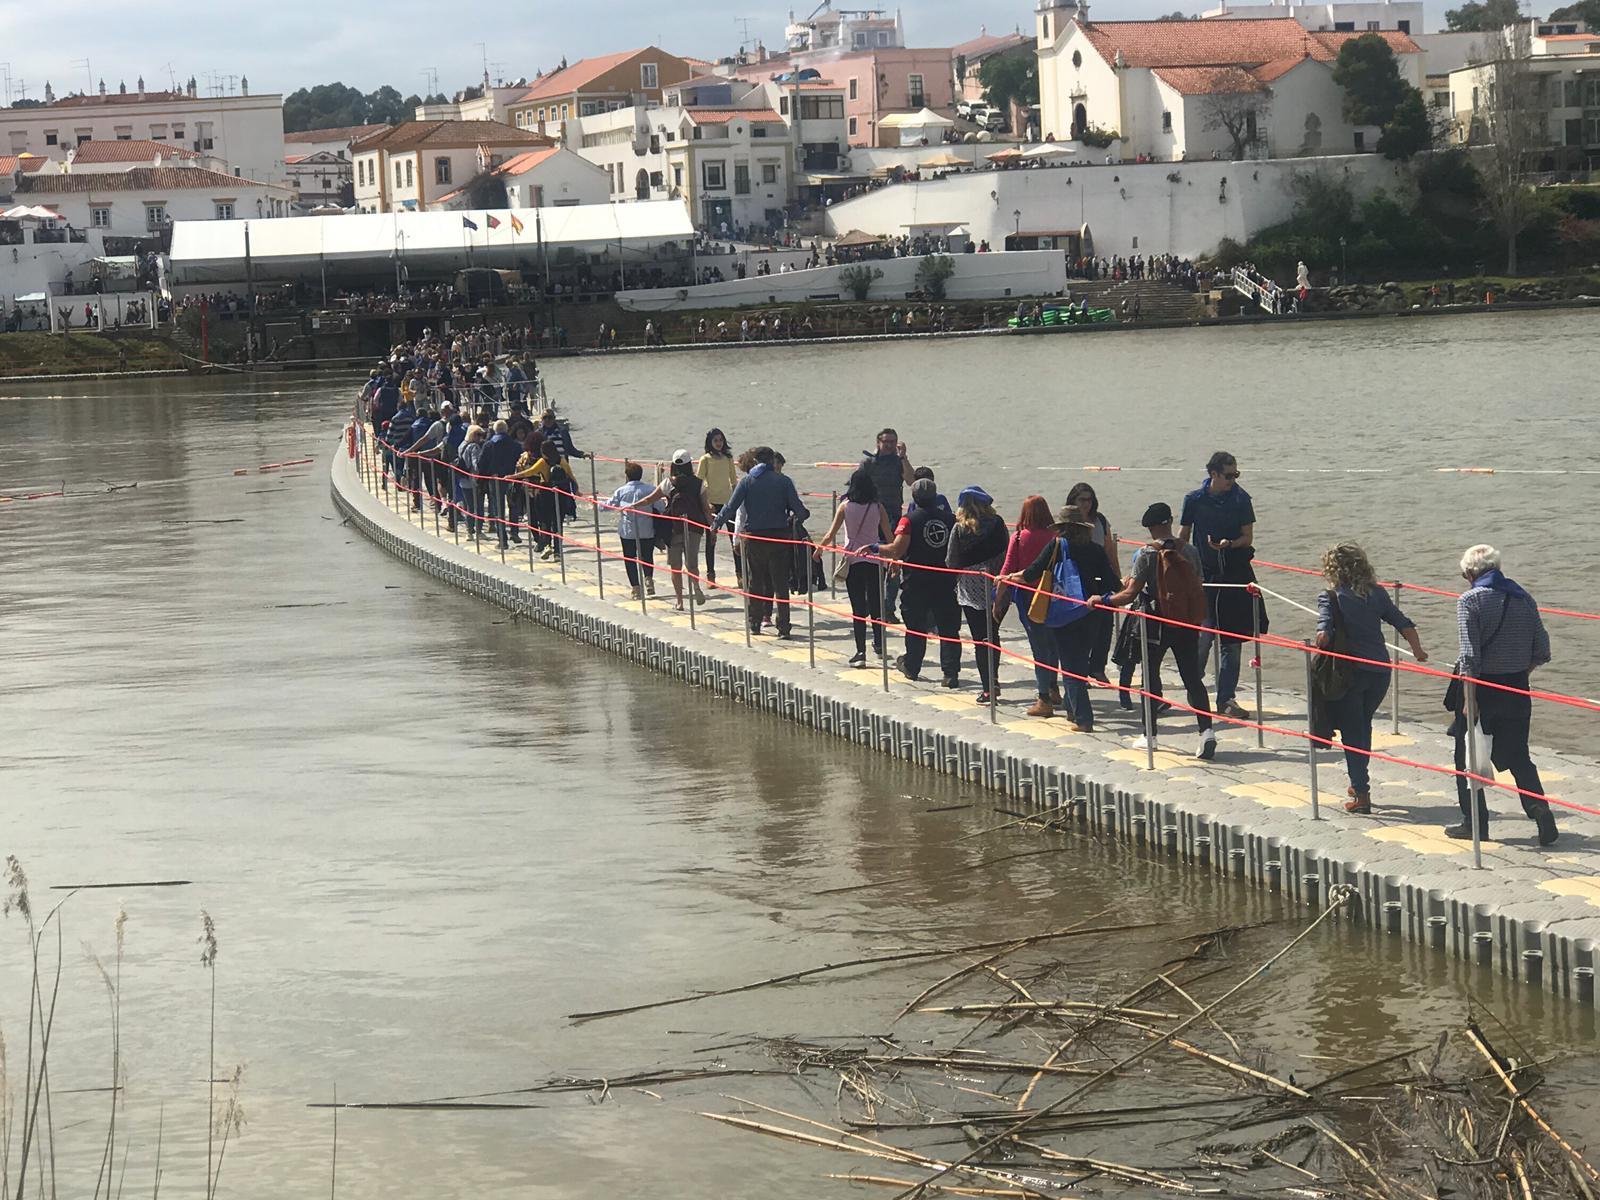 Puente-flotante-pasarela-flotante-feria-contrabando-Unibis20